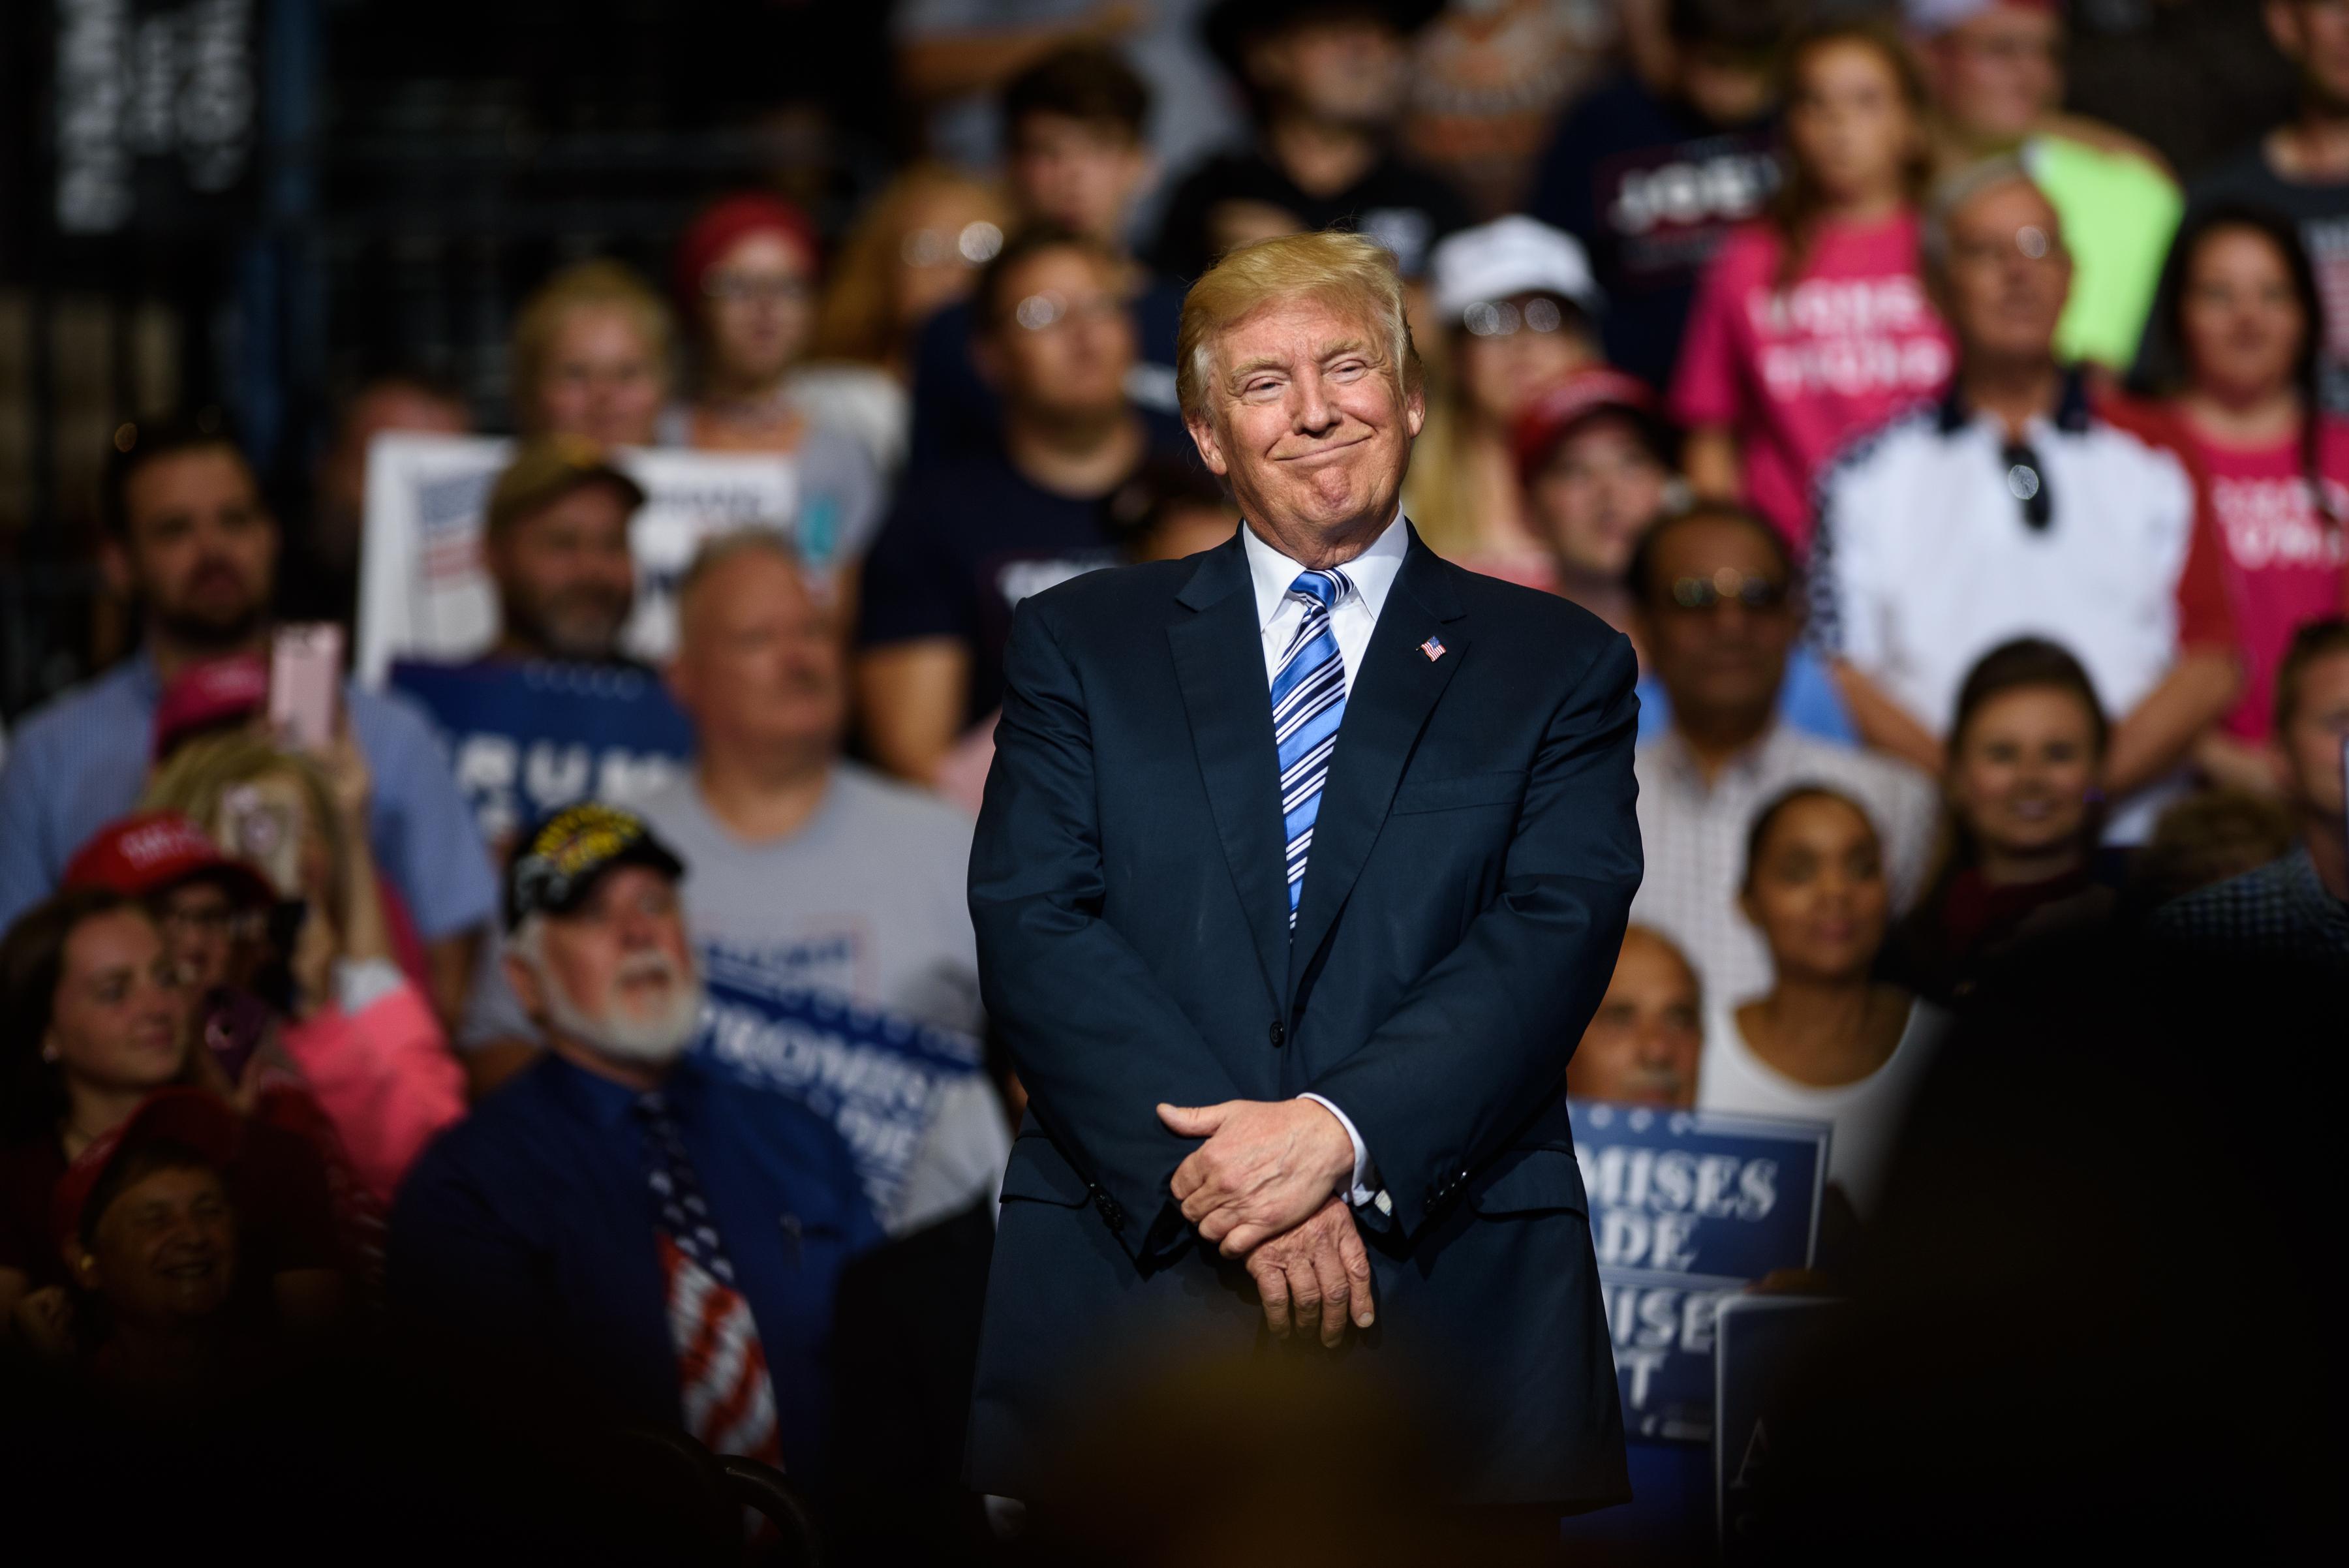 President Trump Holds Rally In Huntington, West Virginia